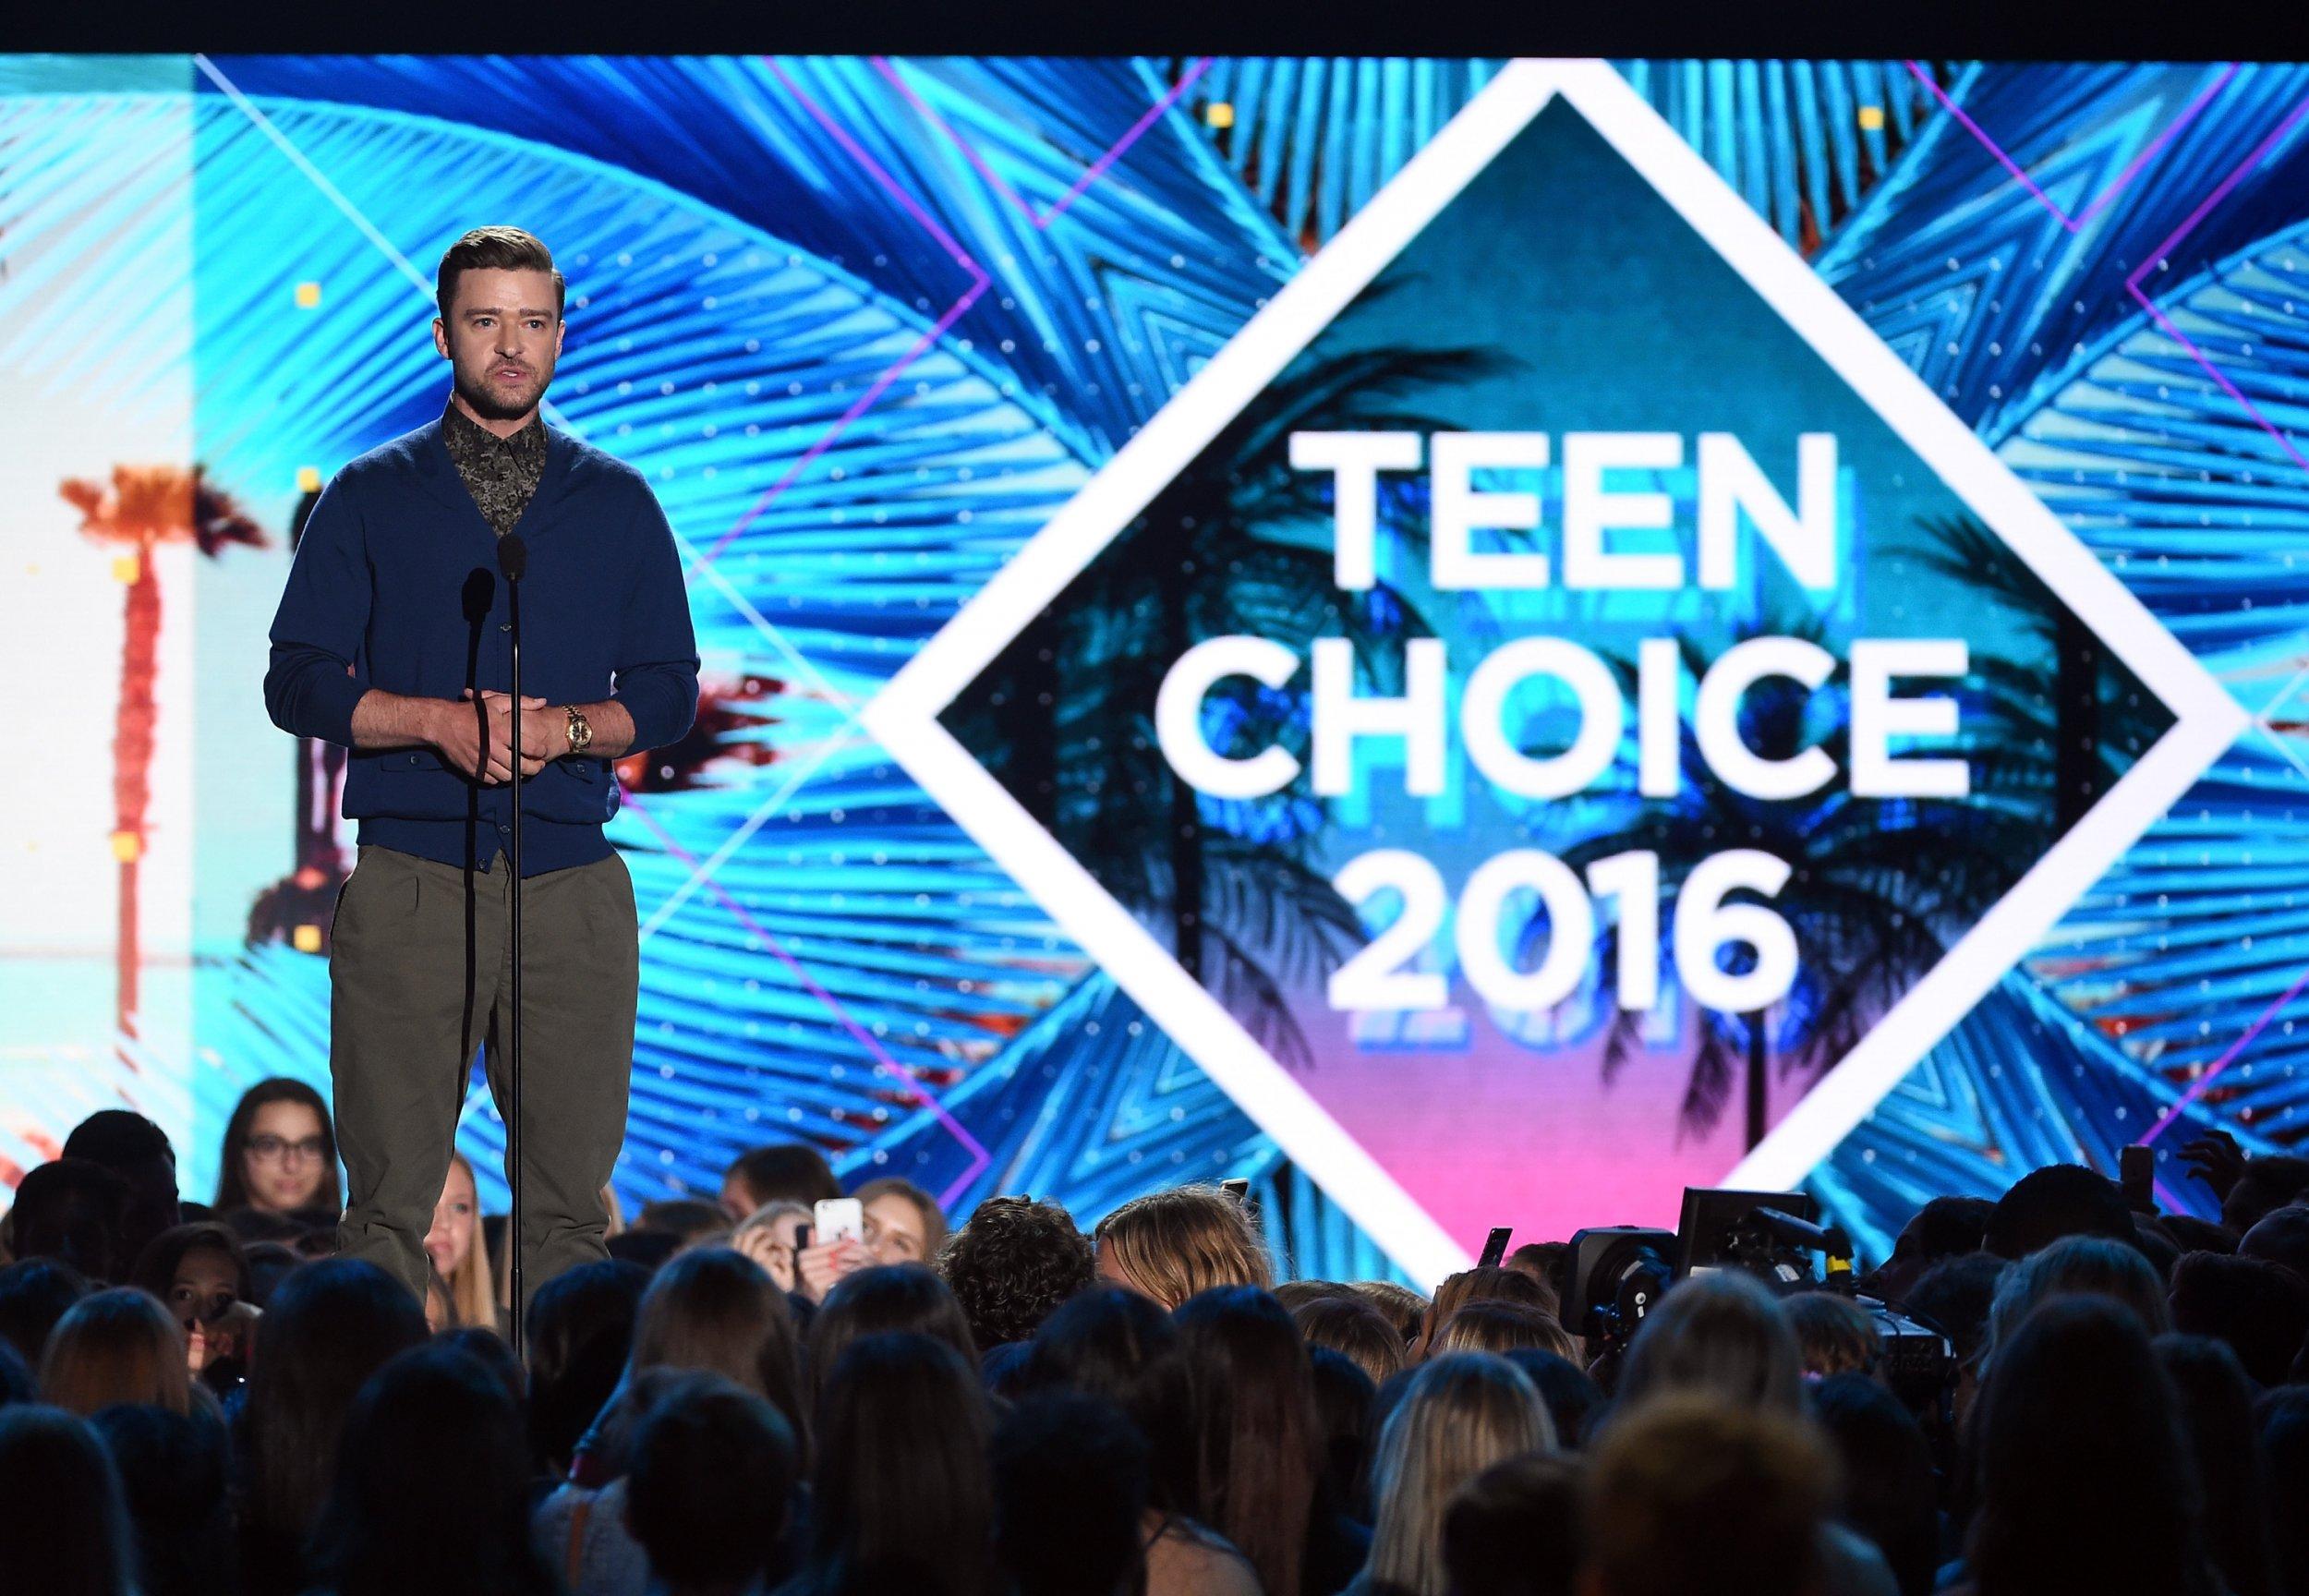 Teen Choice Awards: One Direction Win Big, Justin Timberlake Honored